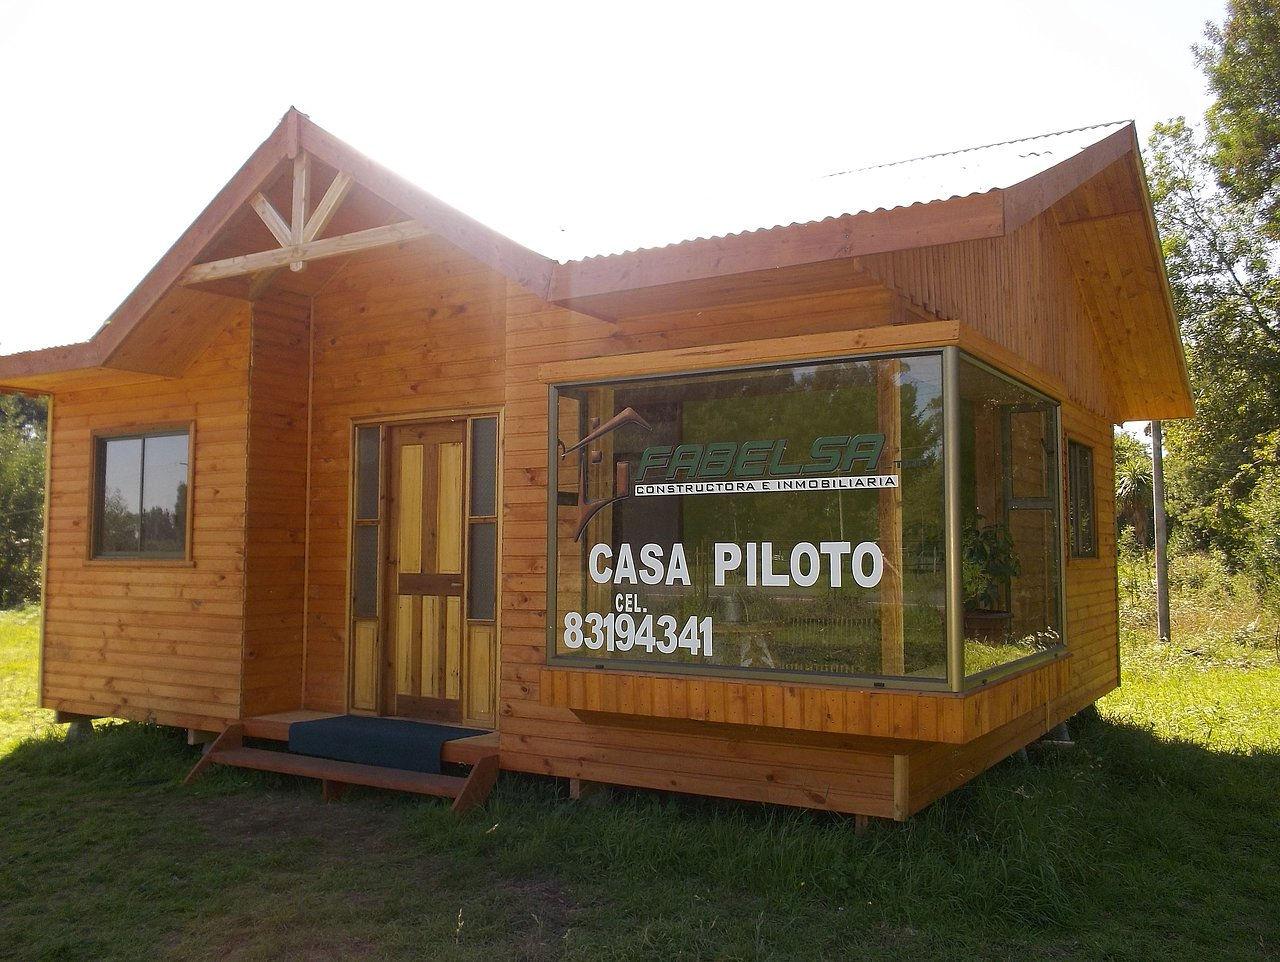 Empresa constructora e inmoviliaria casas prefabricadas - Empresas casas prefabricadas ...